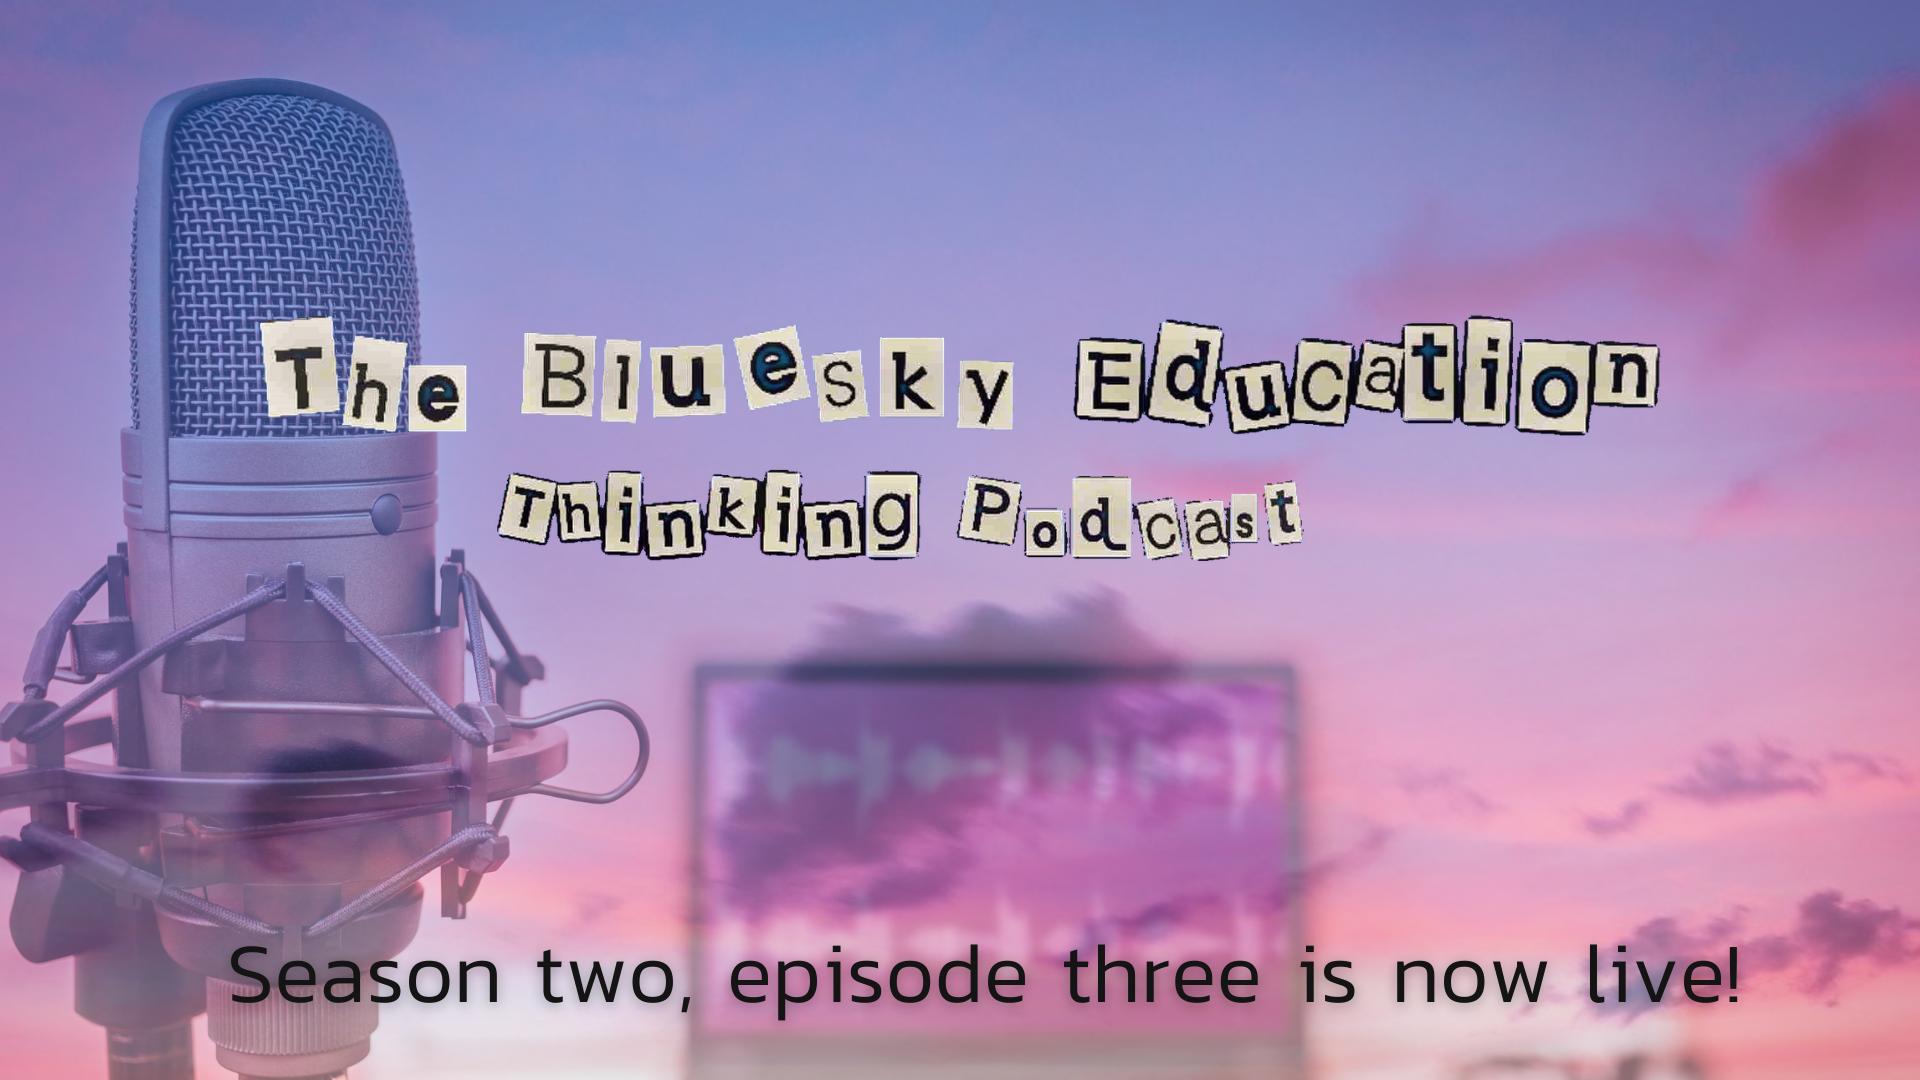 BlueSky Education Thinking Podcast